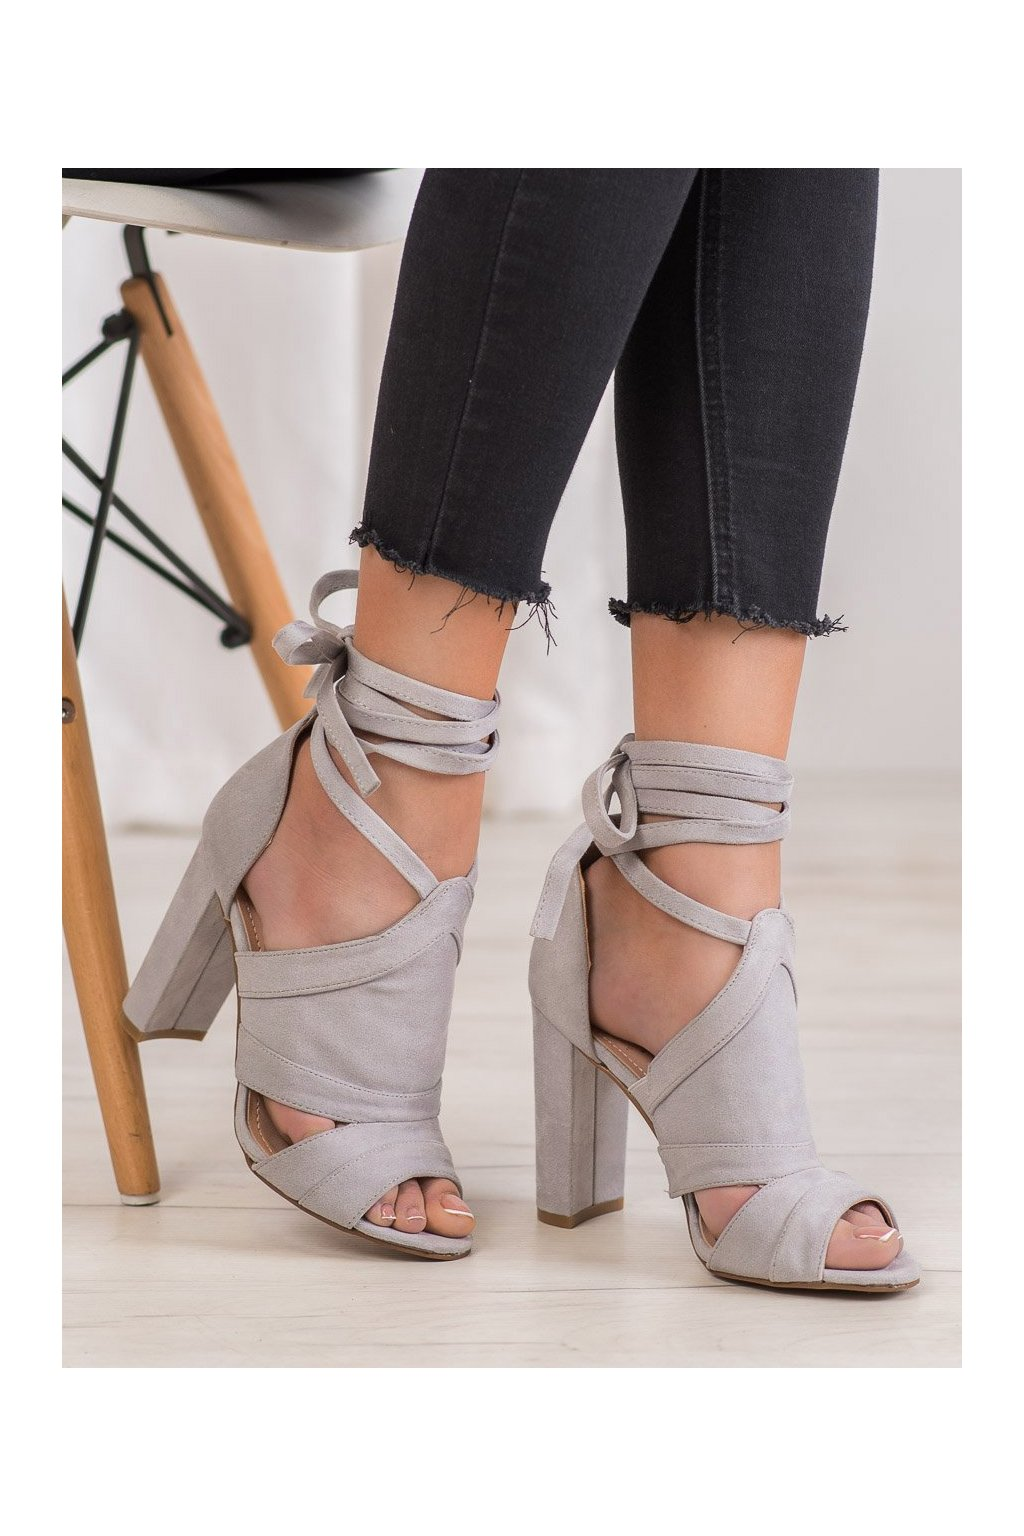 Sivé sandále Seastar kod NS112LT.G